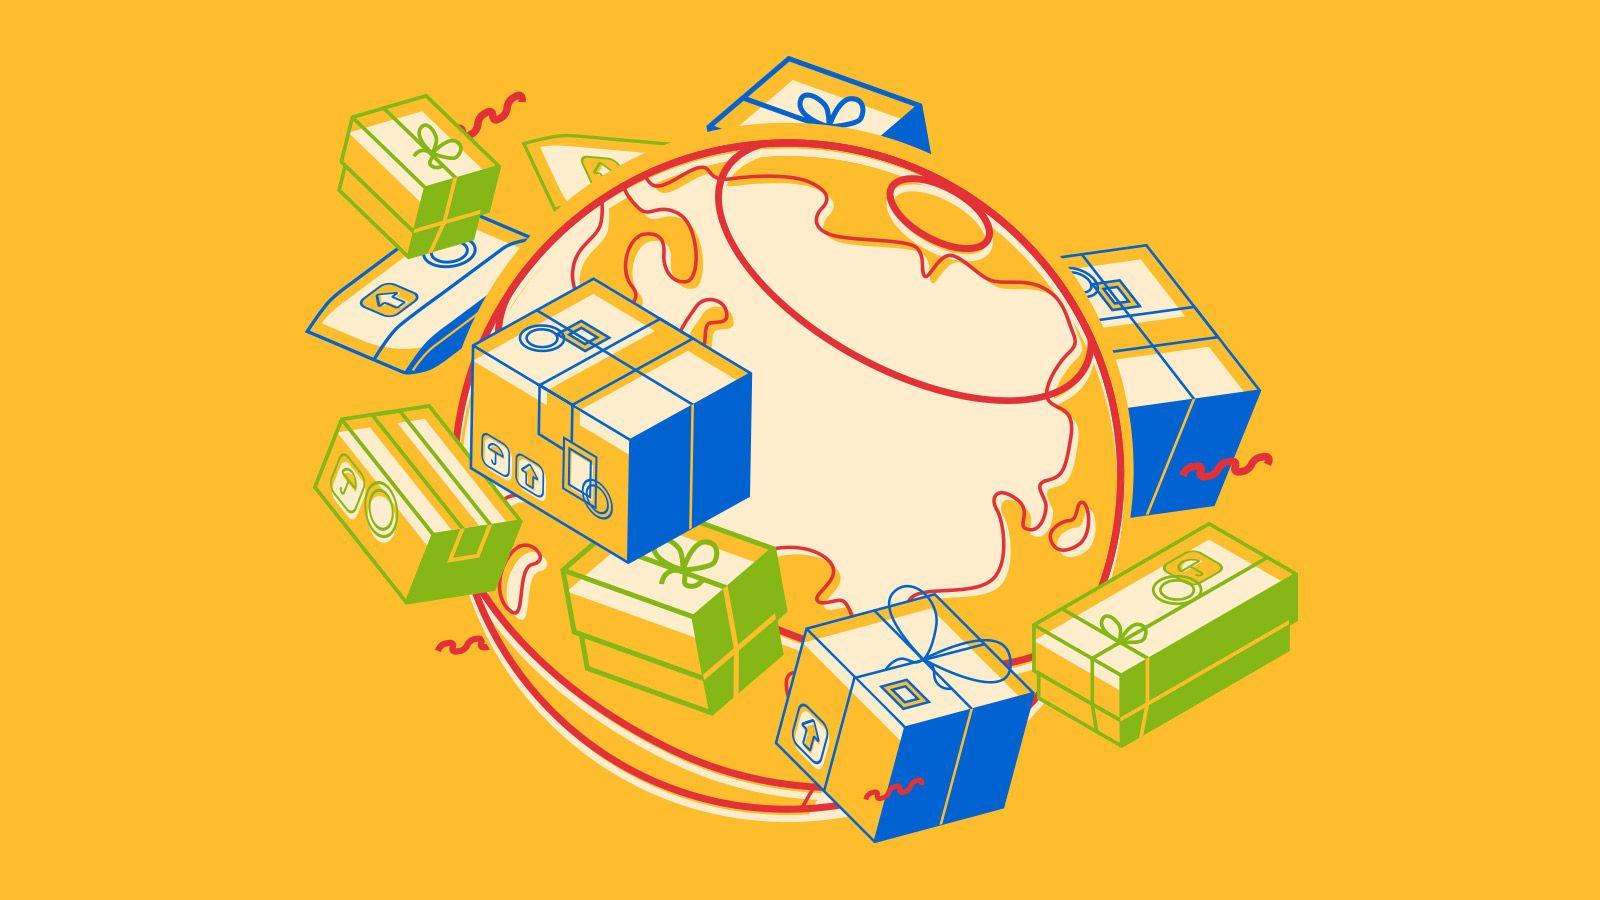 How to Ship eBay Items Internationally?